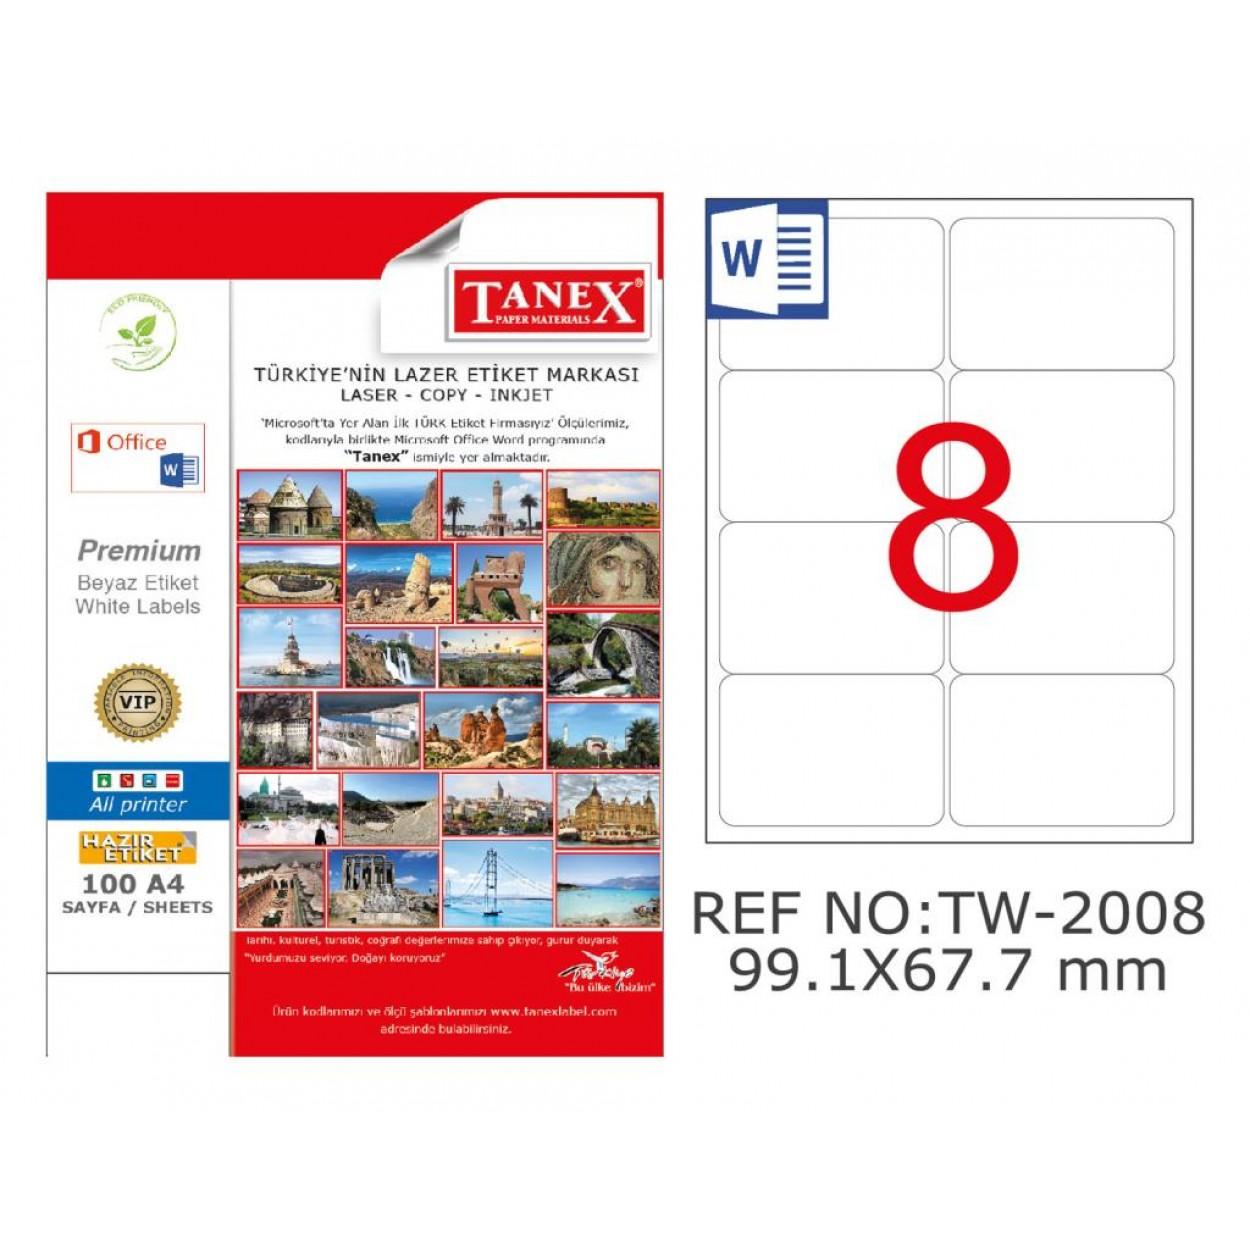 Tanex TW-2008 99.1x67.7mm Şeffaf Laser Etiket 200 Lü